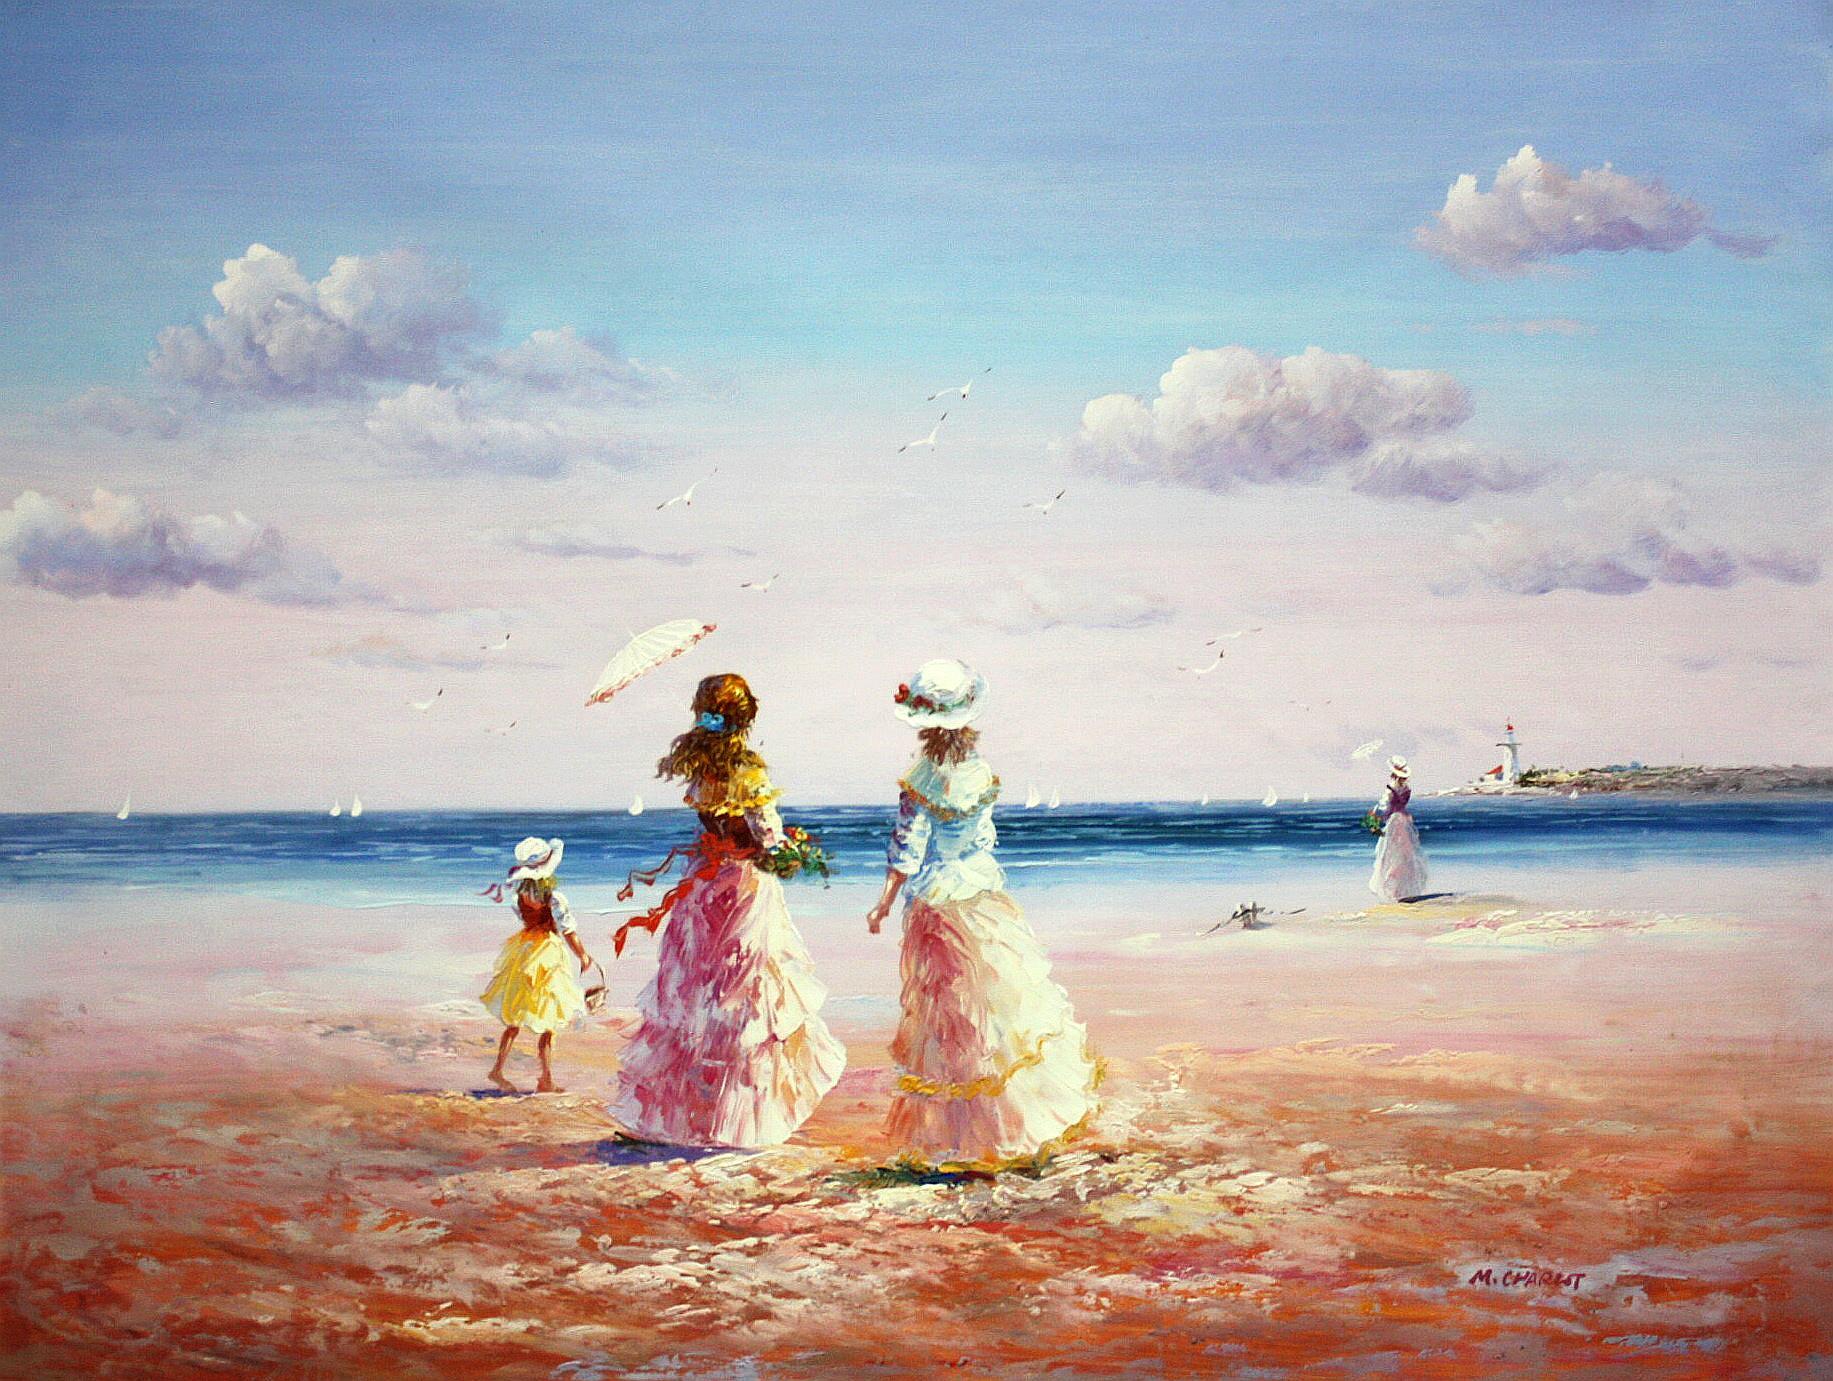 Sylt - Spaziergang am Strand k94334 90x120cm exzellentes Gemälde